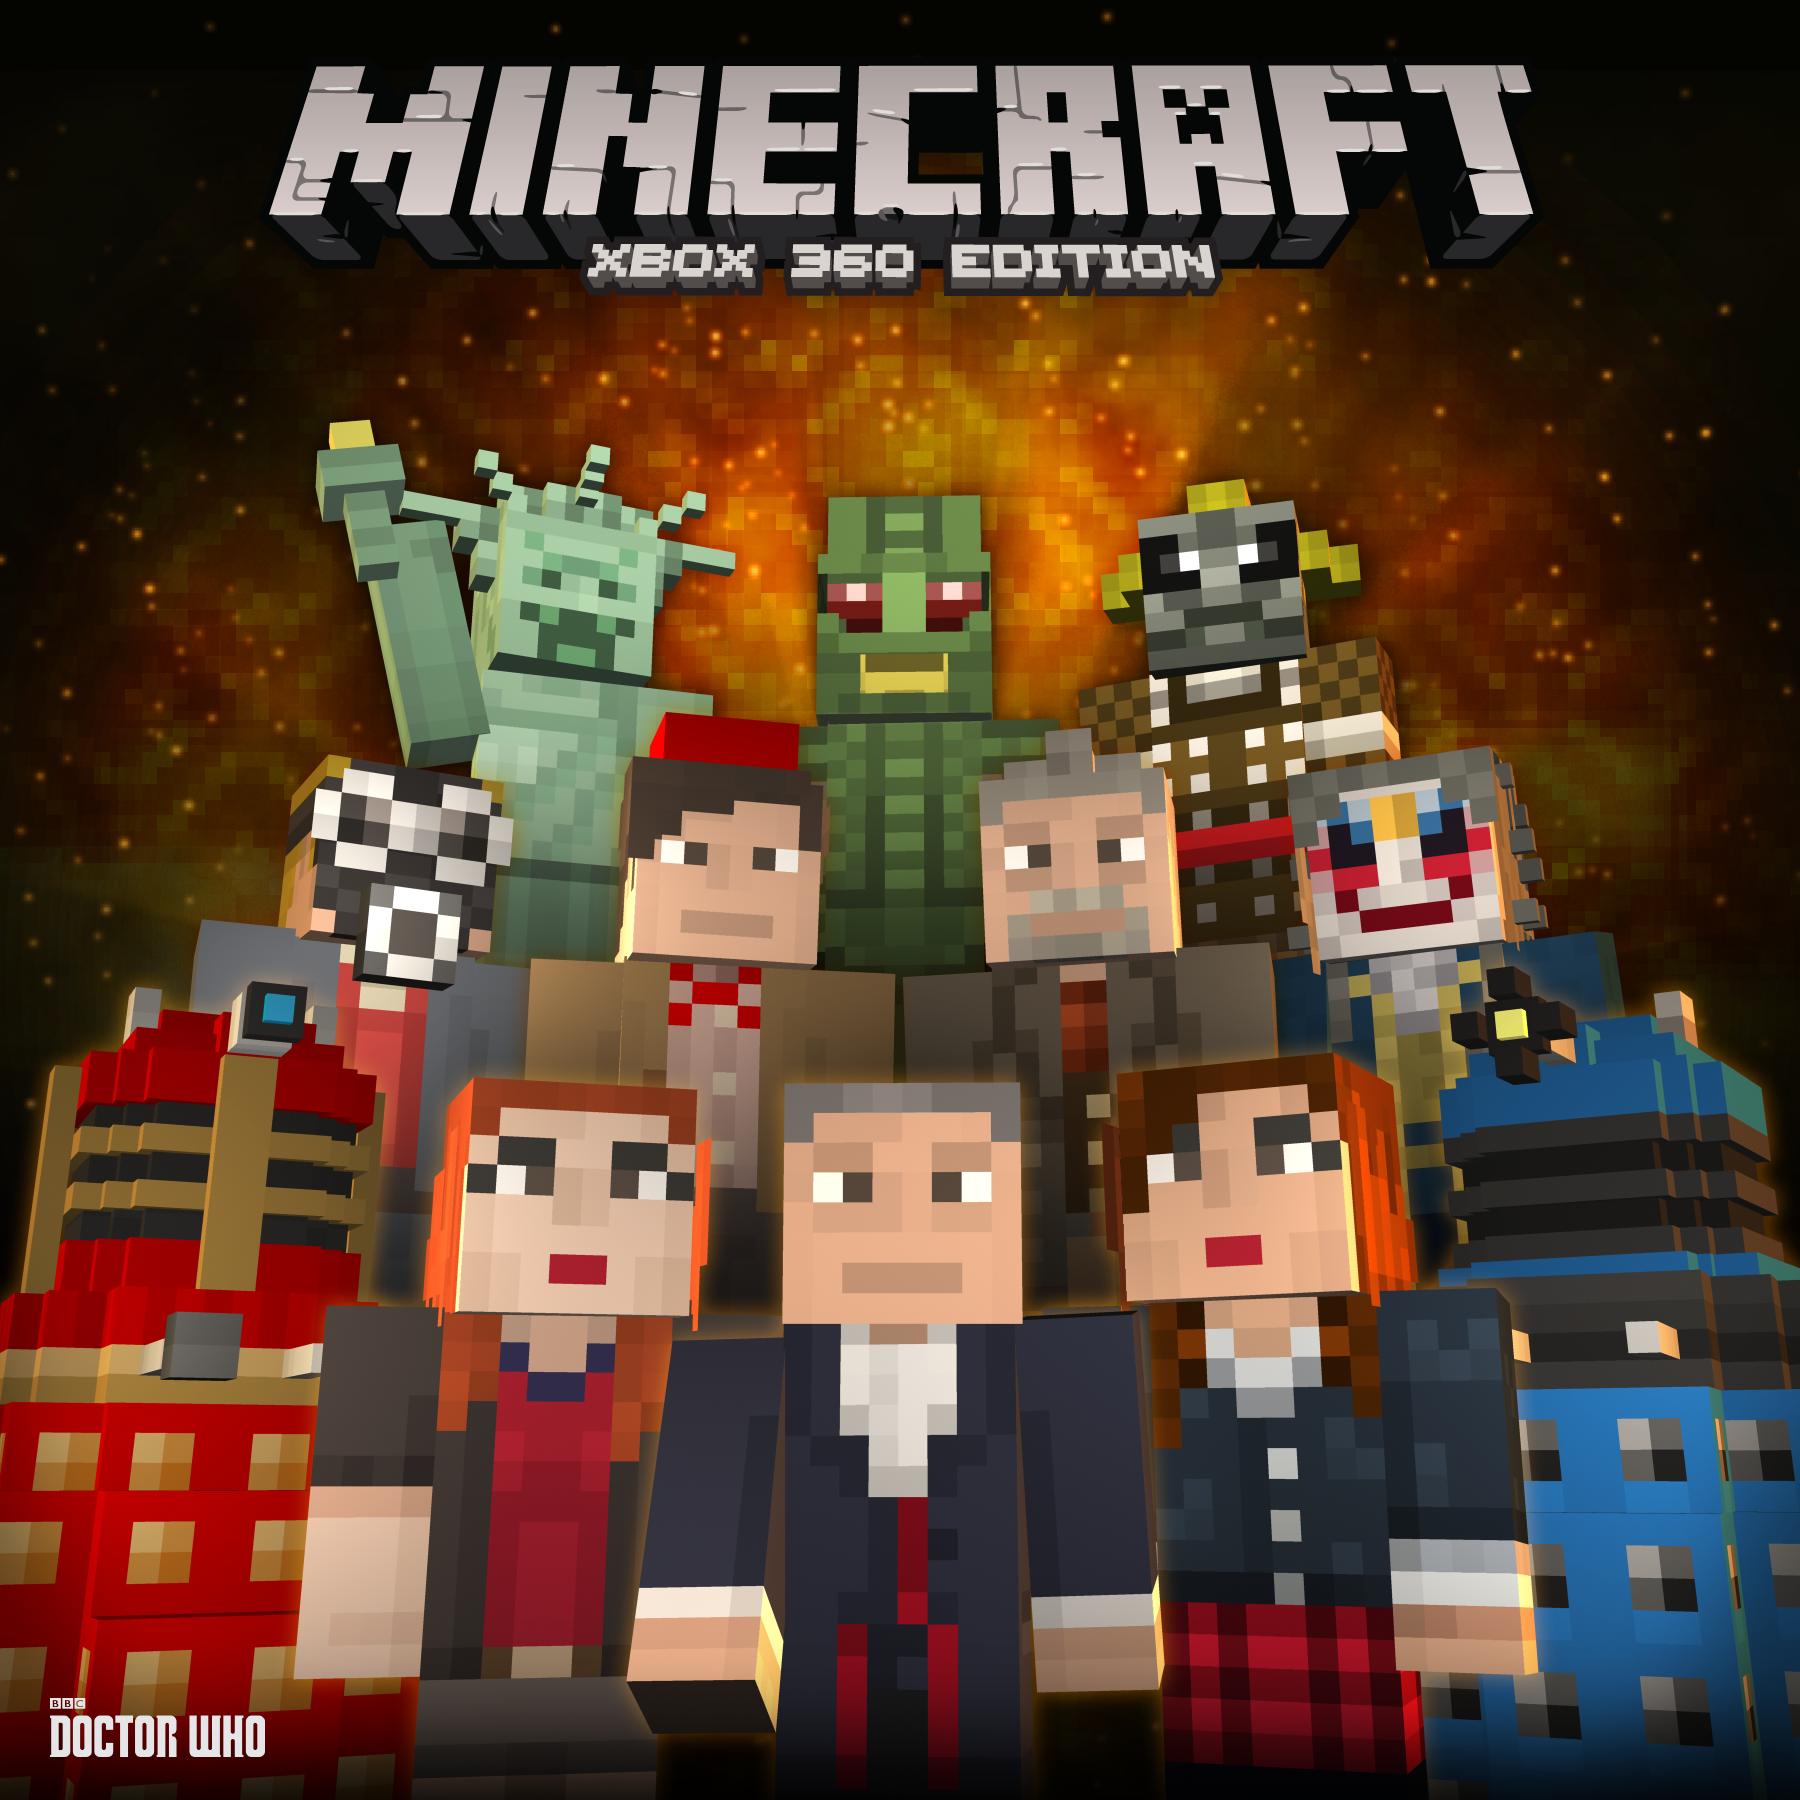 d9199d68994047d624b725b2b60e9957 - How To Get Skin Packs In Minecraft Xbox 360 Free